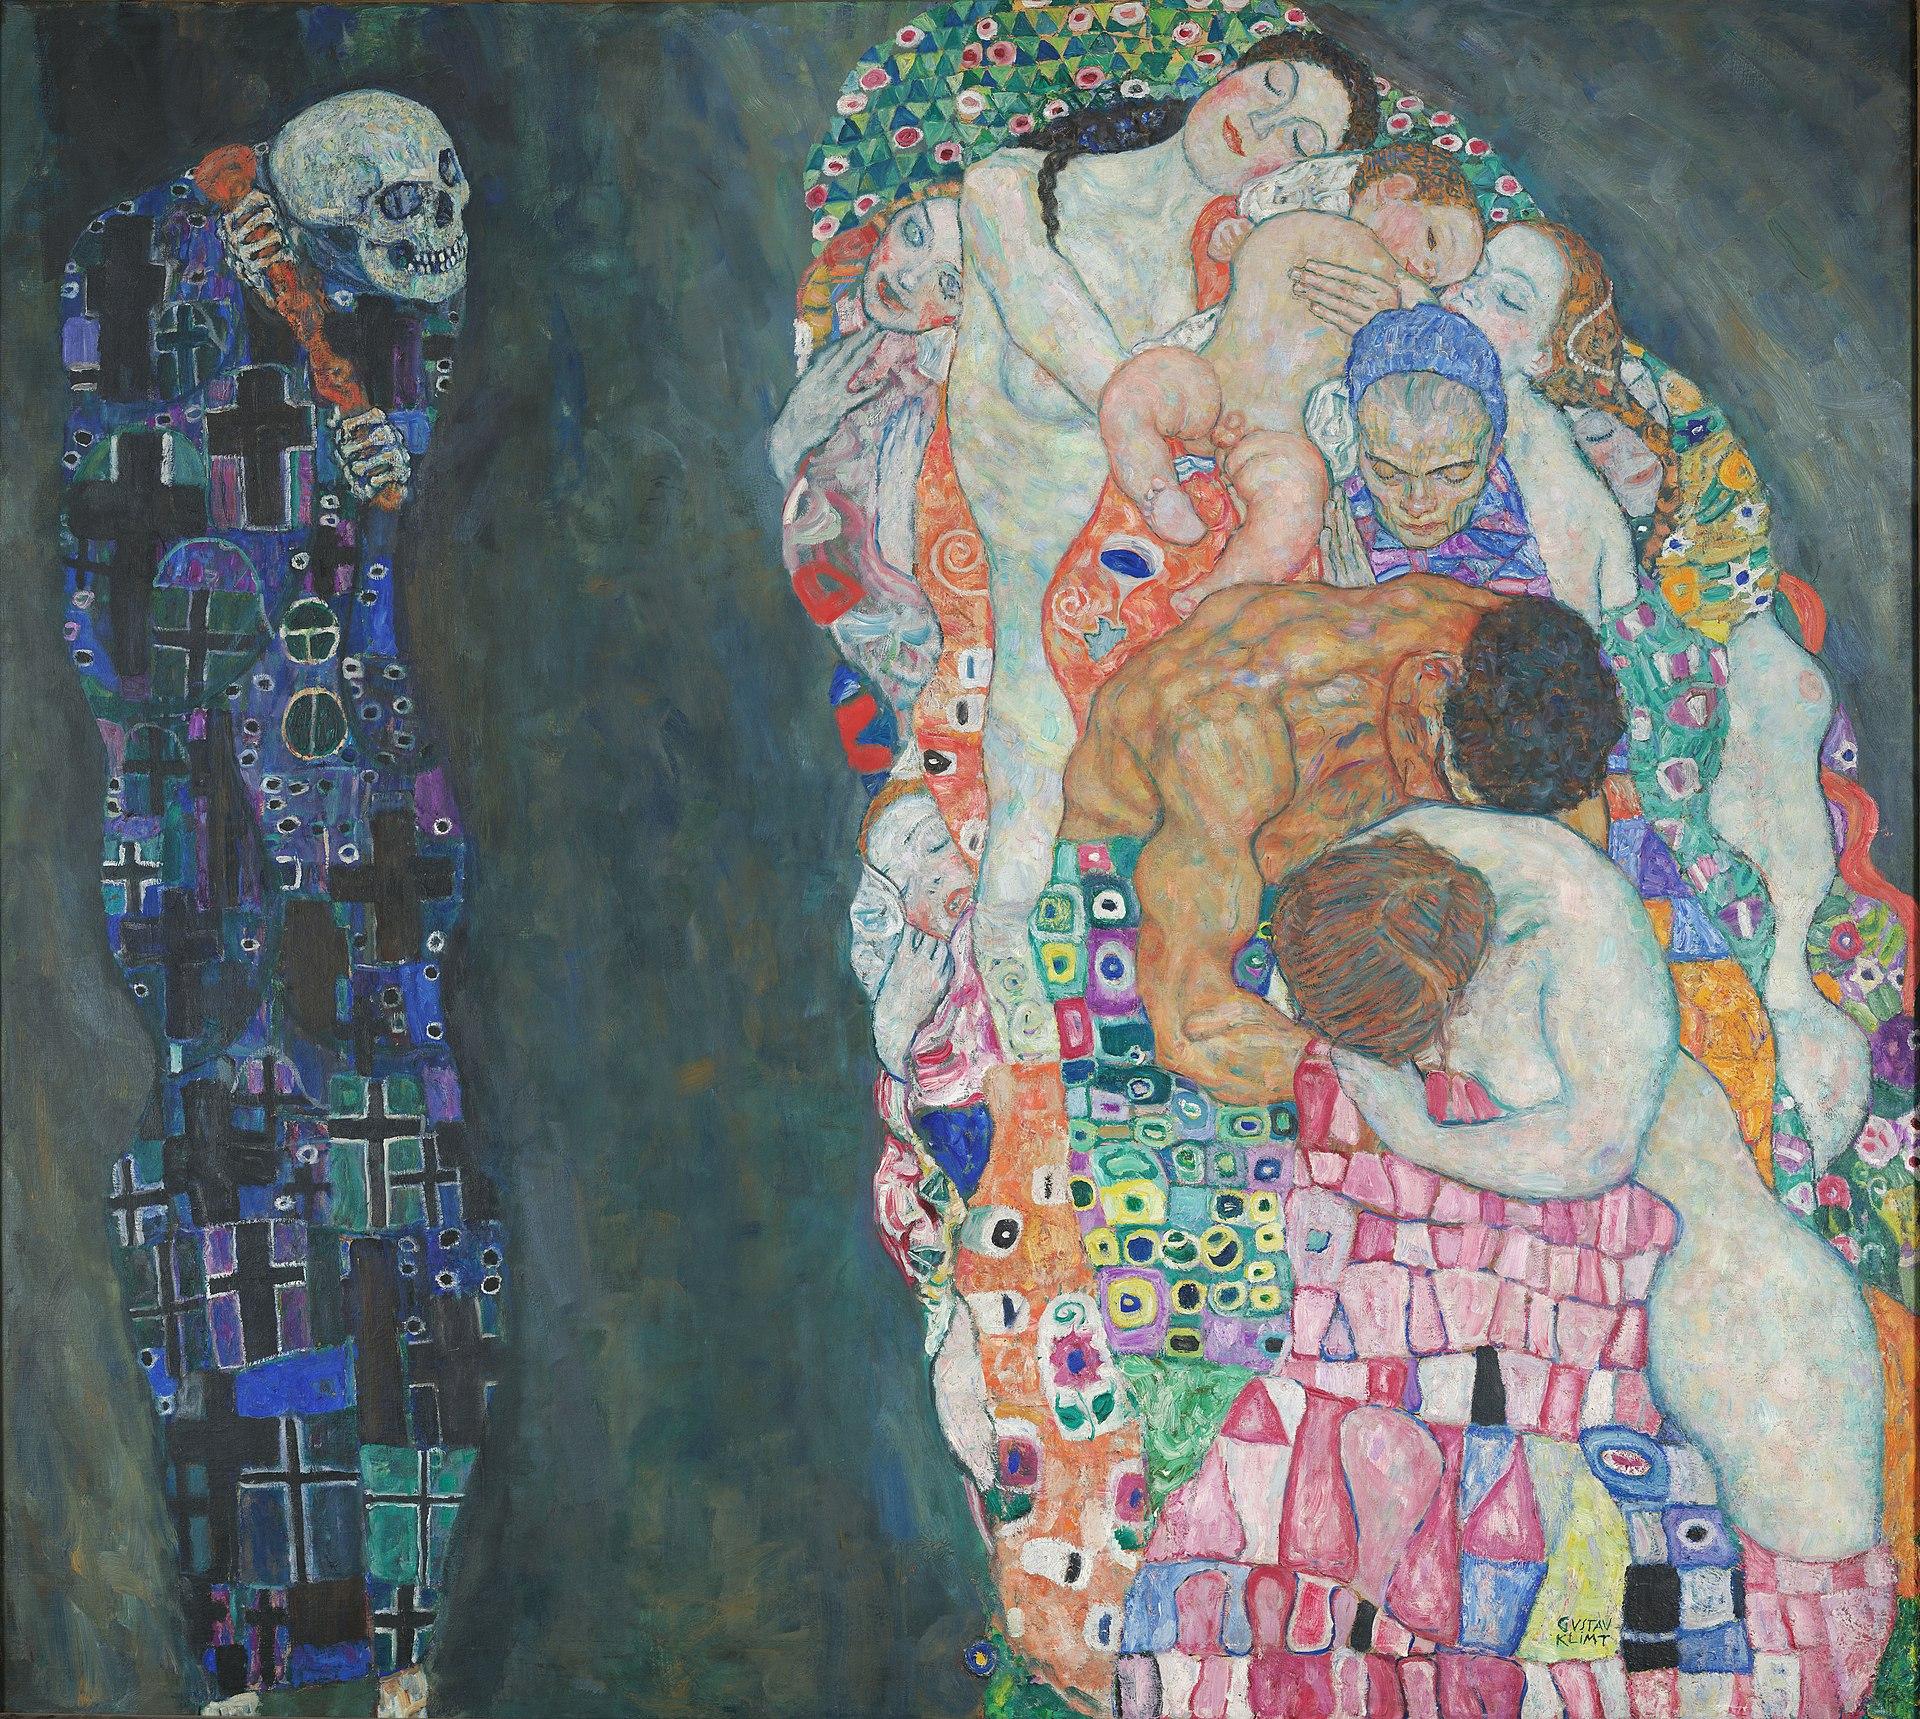 https://upload.wikimedia.org/wikipedia/commons/thumb/7/7d/Death_and_Life_-_Gustav_Klimt.jpg/1920px-Death_and_Life_-_Gustav_Klimt.jpg